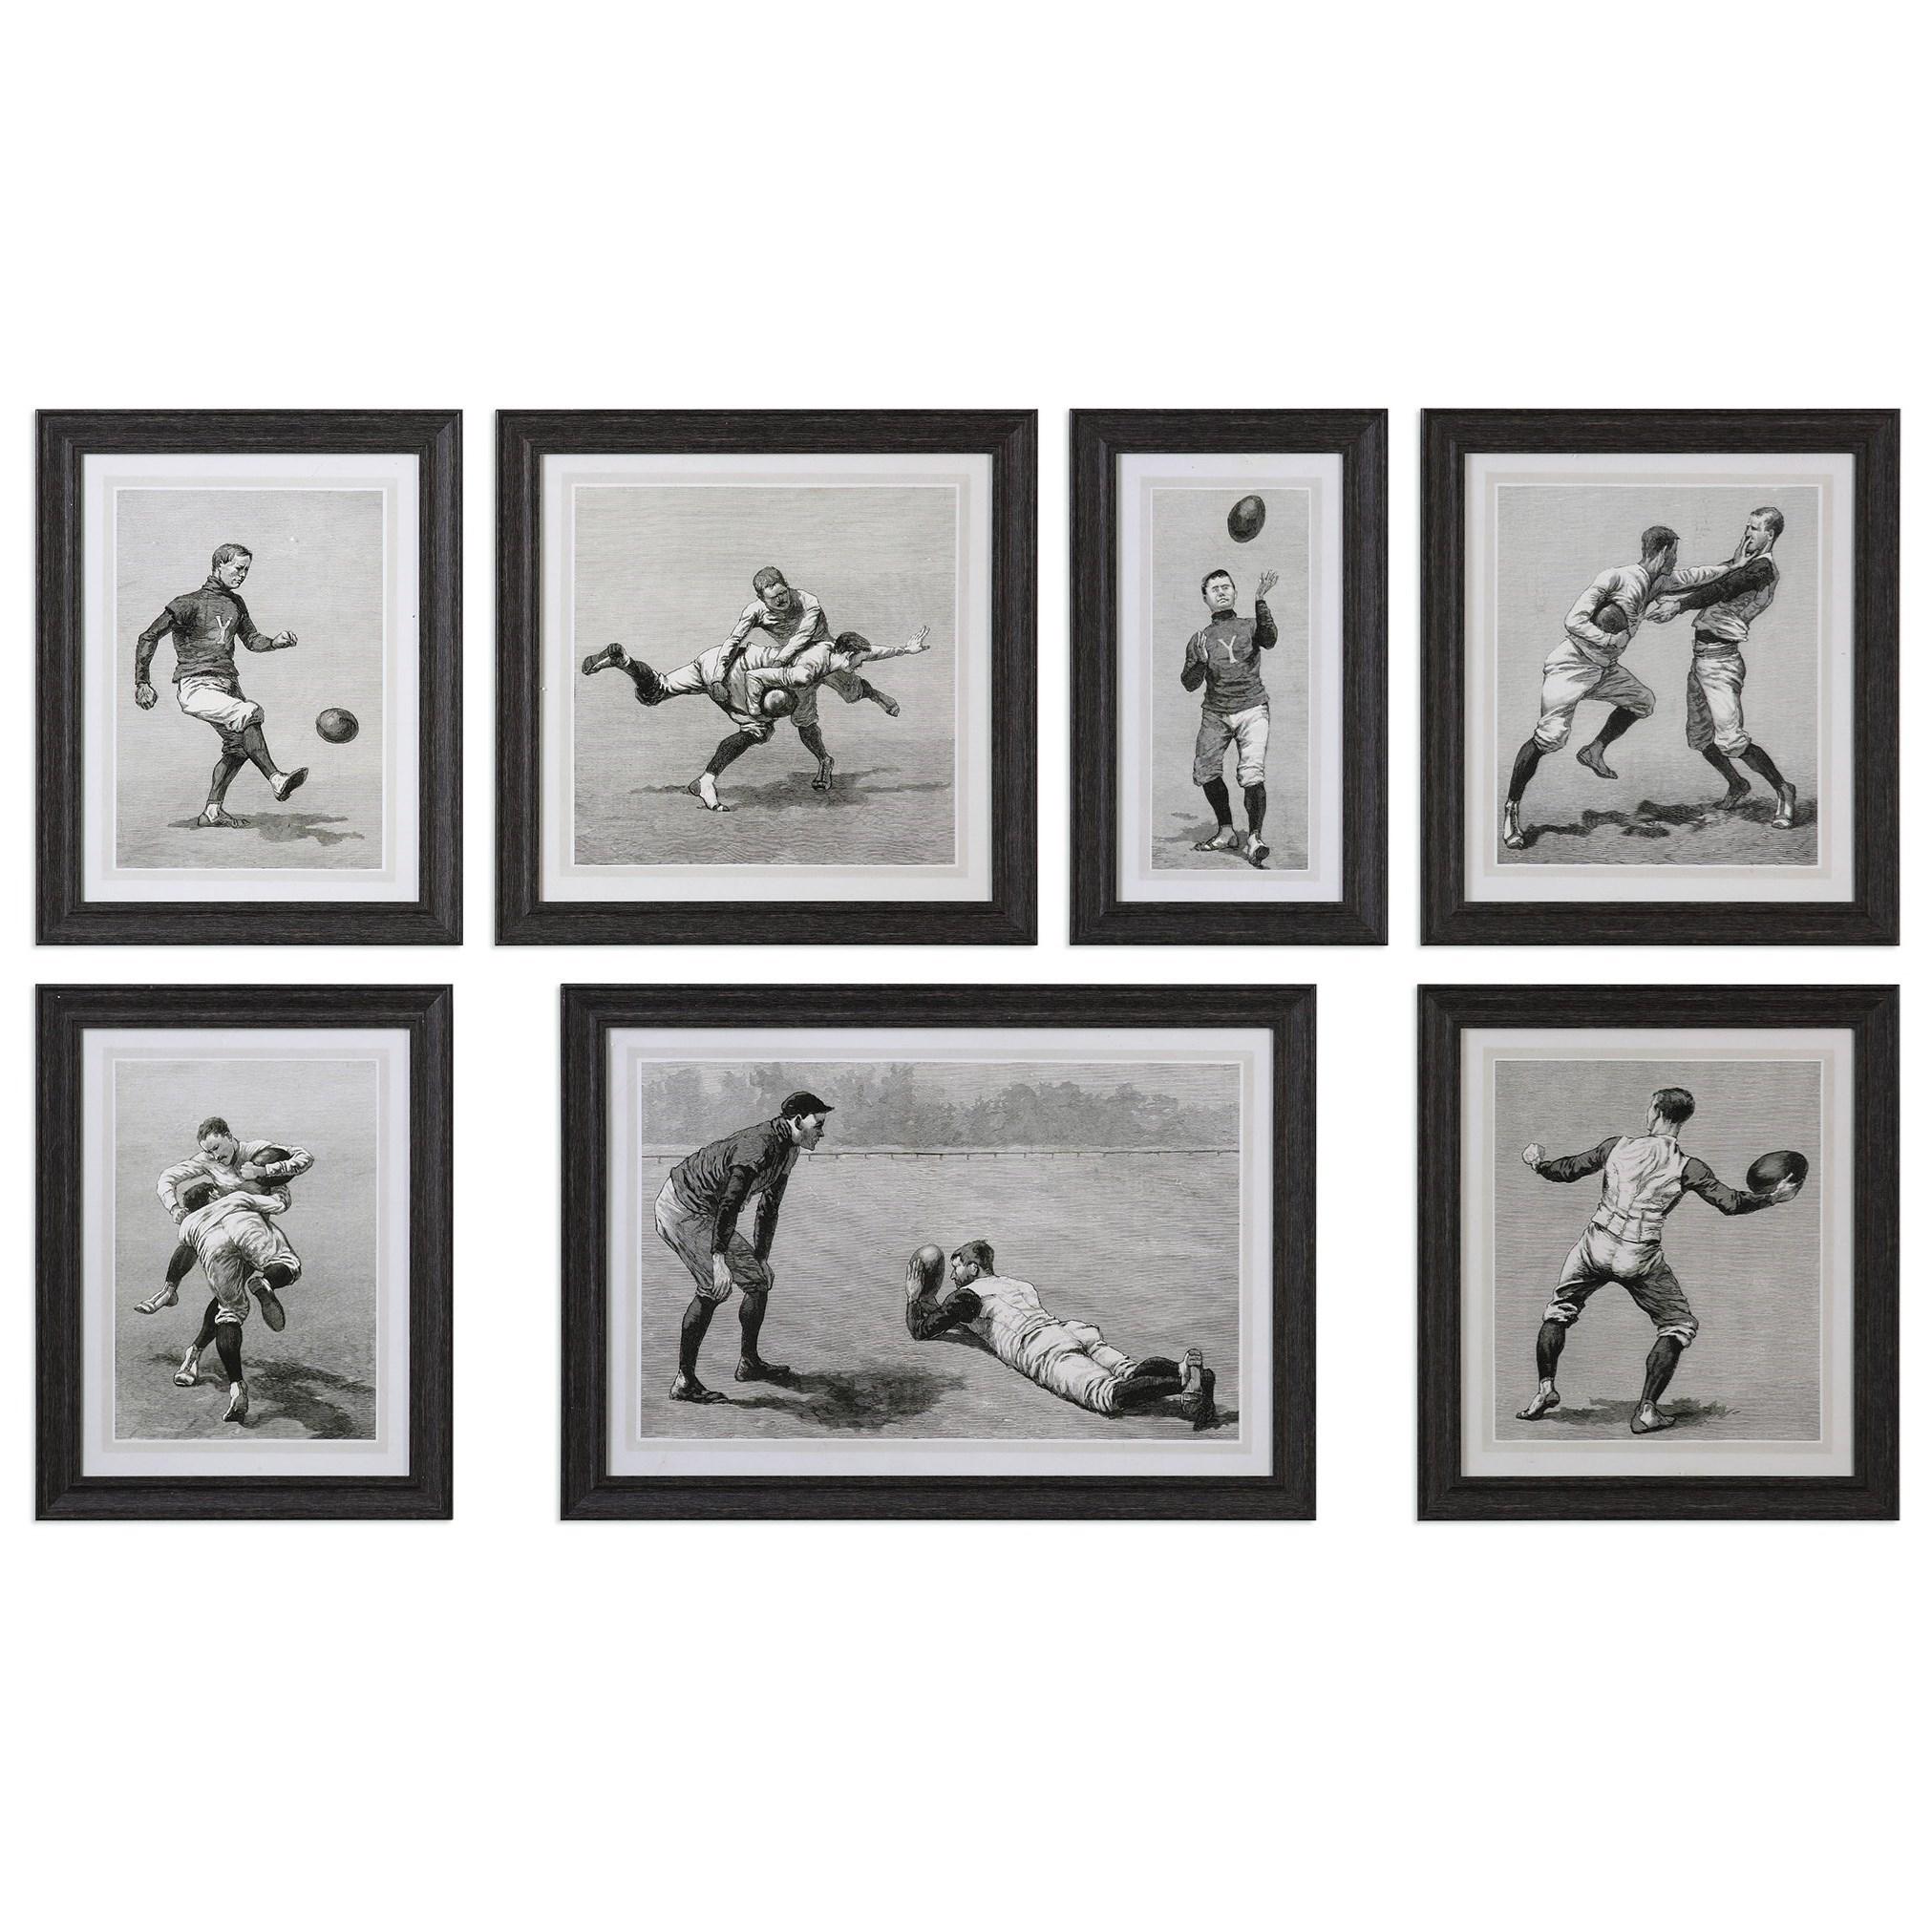 Uttermost Art Vintage Football Techniques (Set of 7) - Item Number: 33655